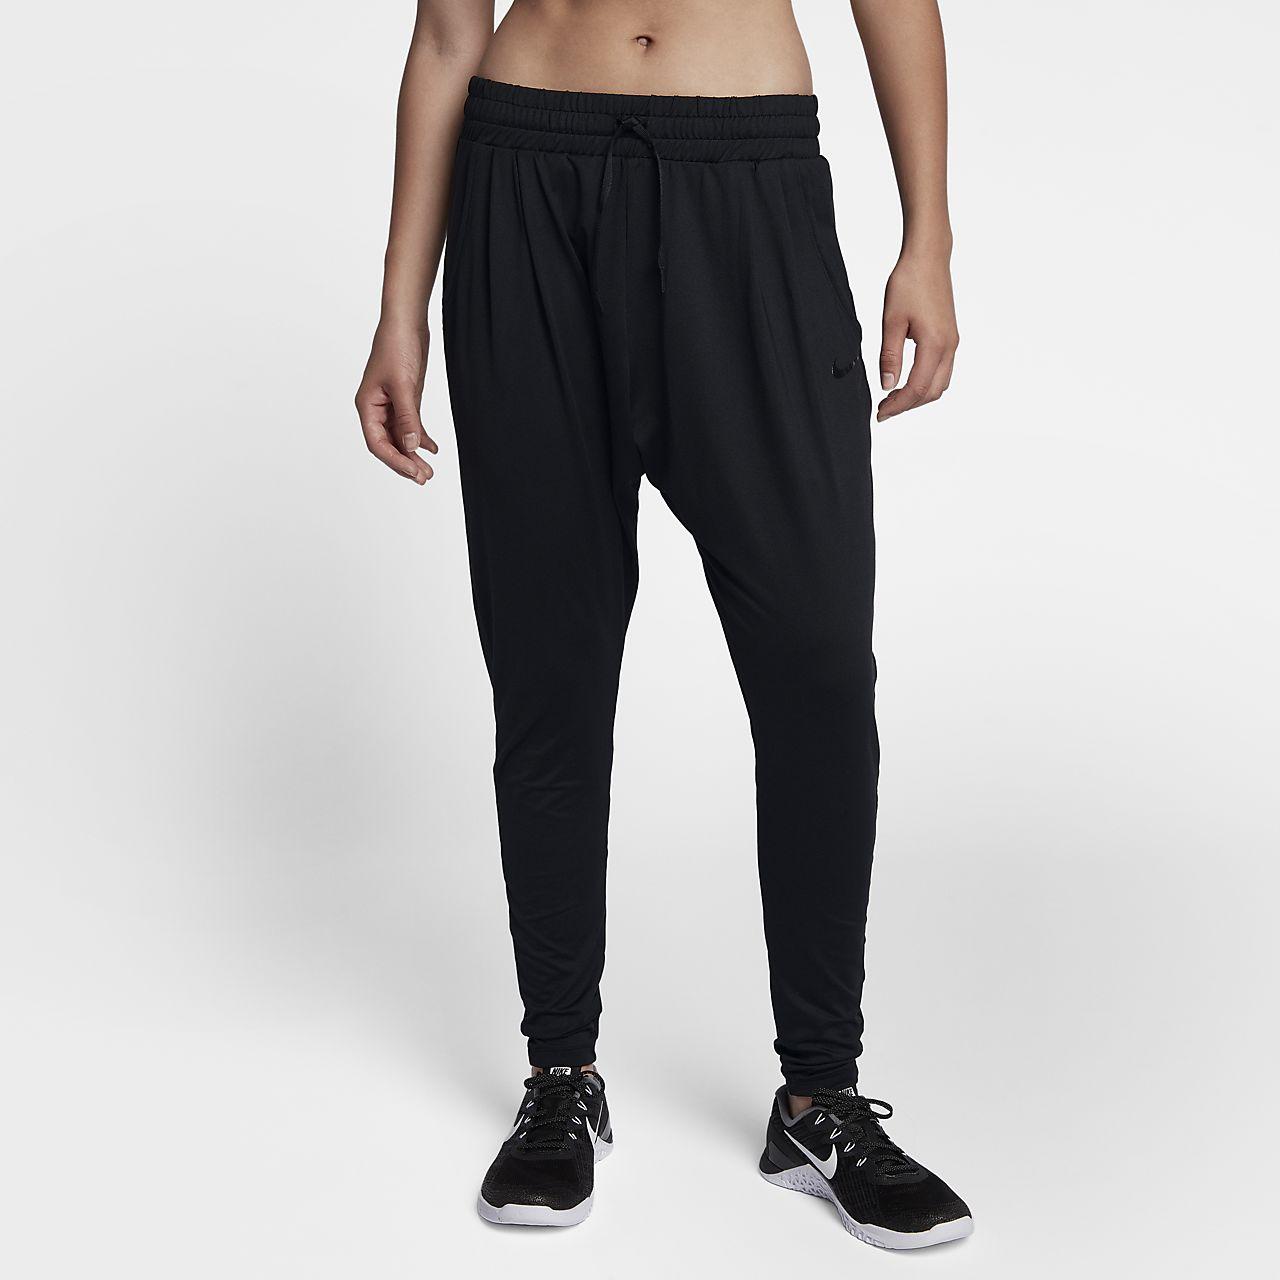 De Entrenamiento Nike Tiro Para Pantalones Medio Mujer Fit Dri 6wdxqH